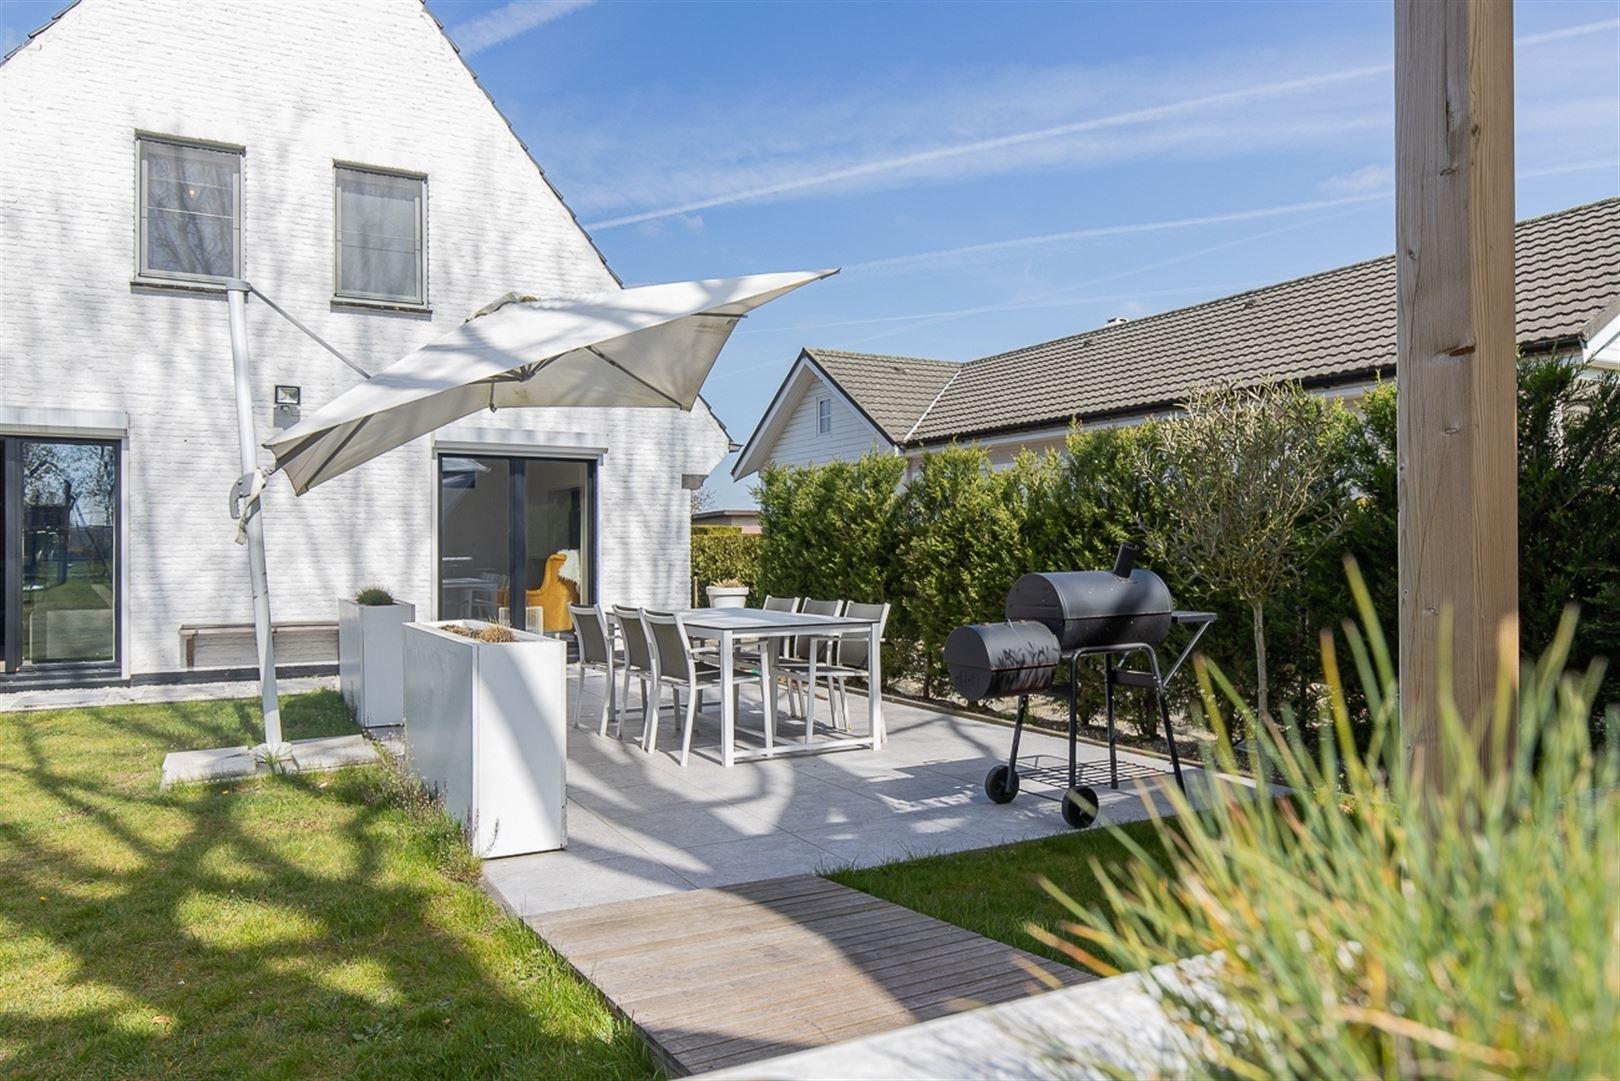 Foto 21 : Villa te 9100 SINT-NIKLAAS (België) - Prijs € 549.000